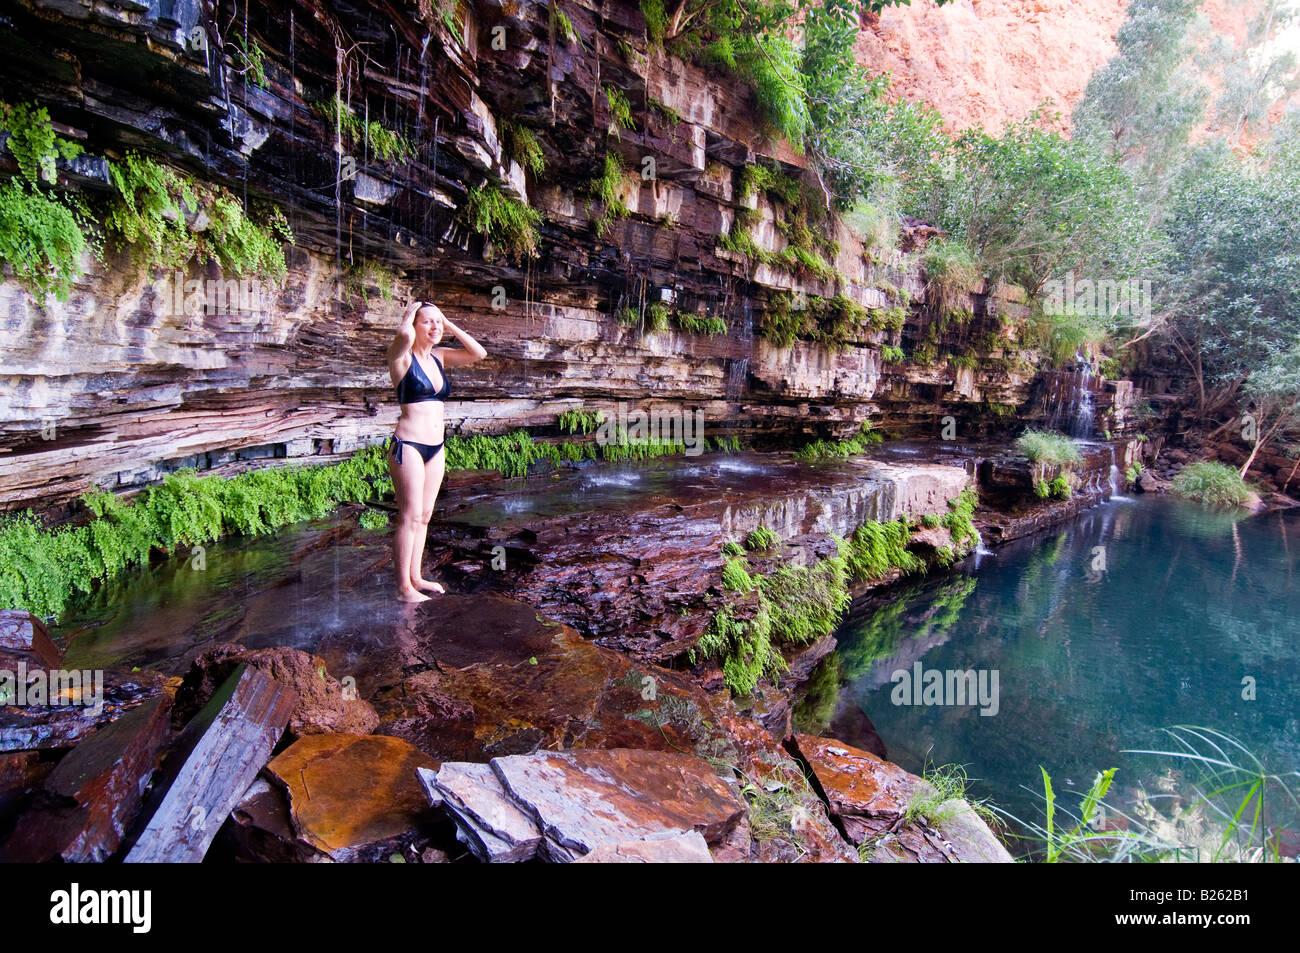 Waterfall Shower At Circular Pool In Karijini National Park Western Australia